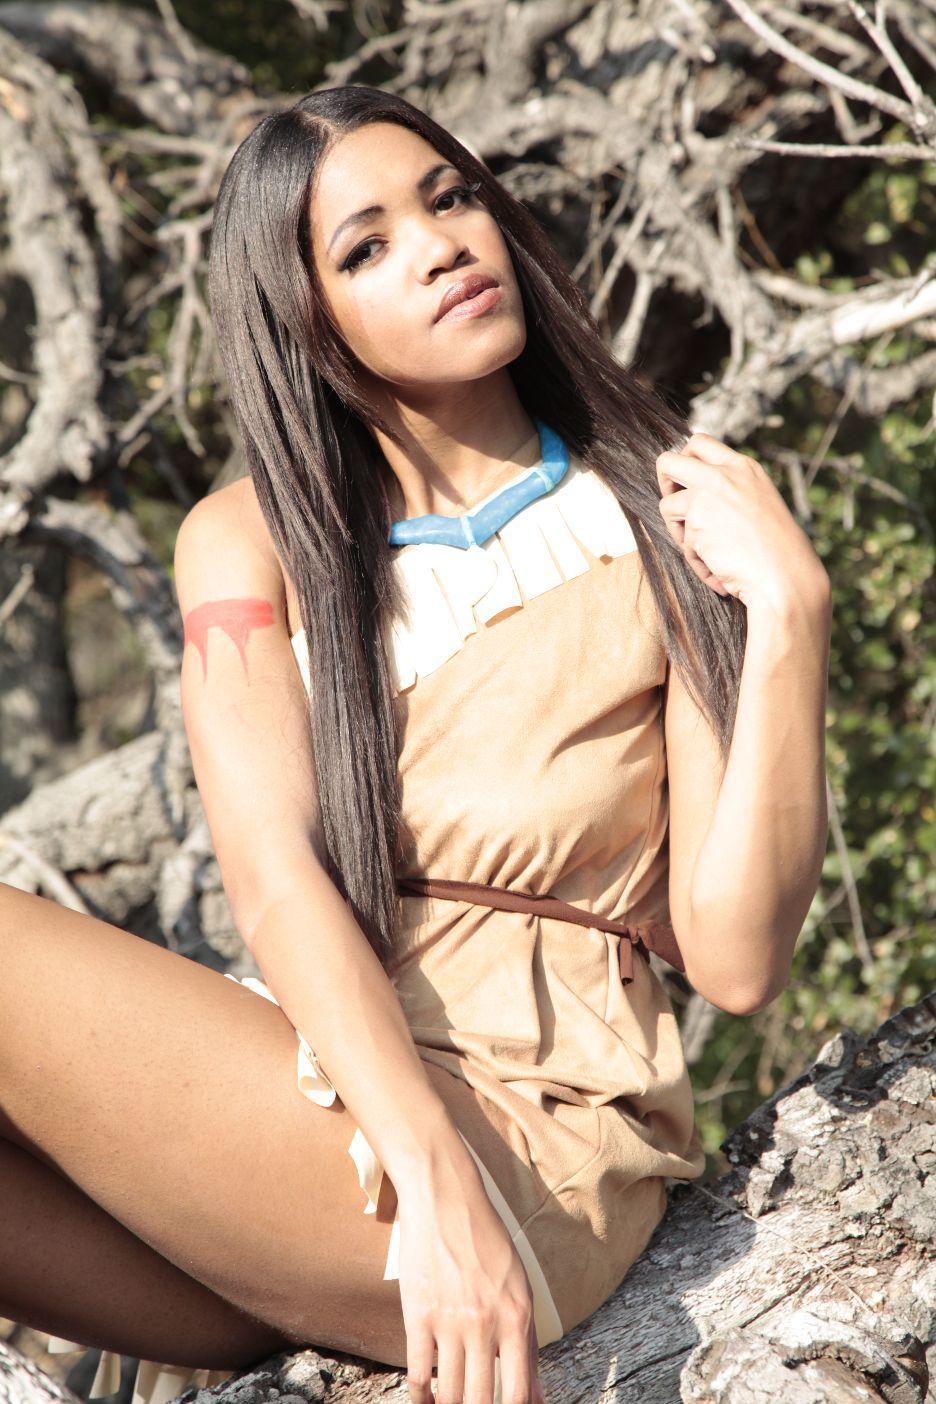 Nude American Indian Pics